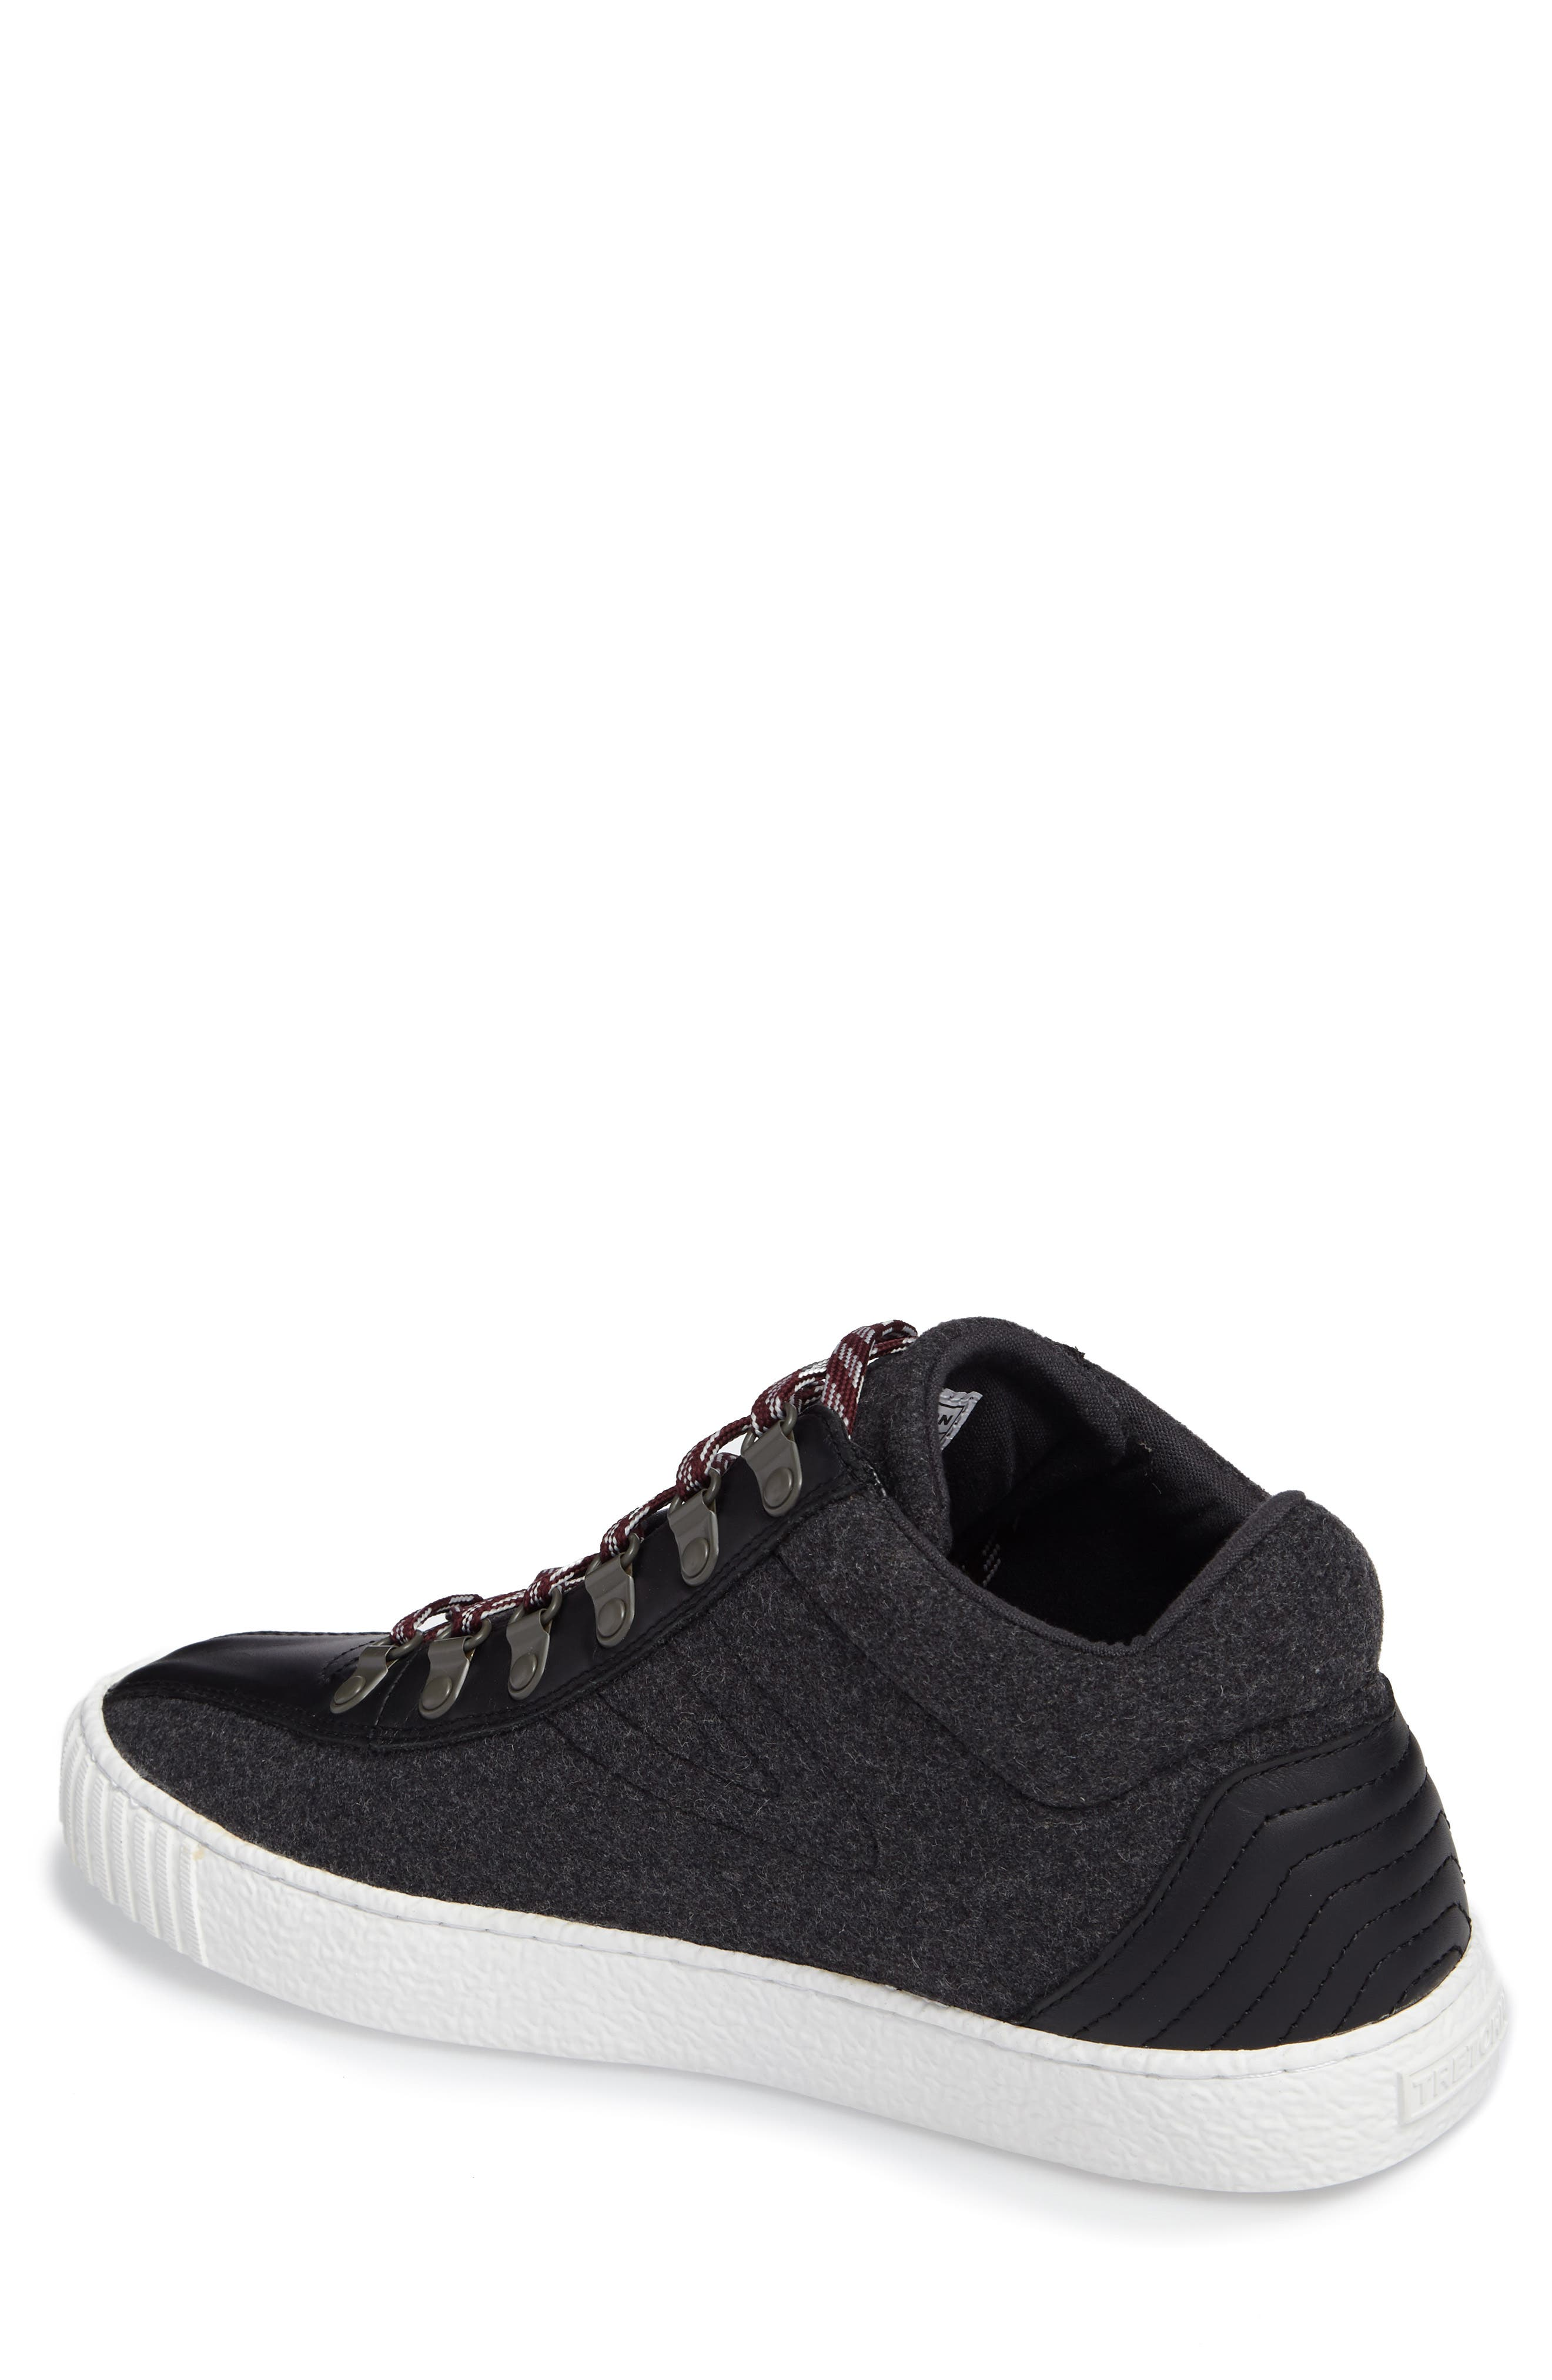 Dante Sneaker,                             Alternate thumbnail 2, color,                             Dark Grey/ Black